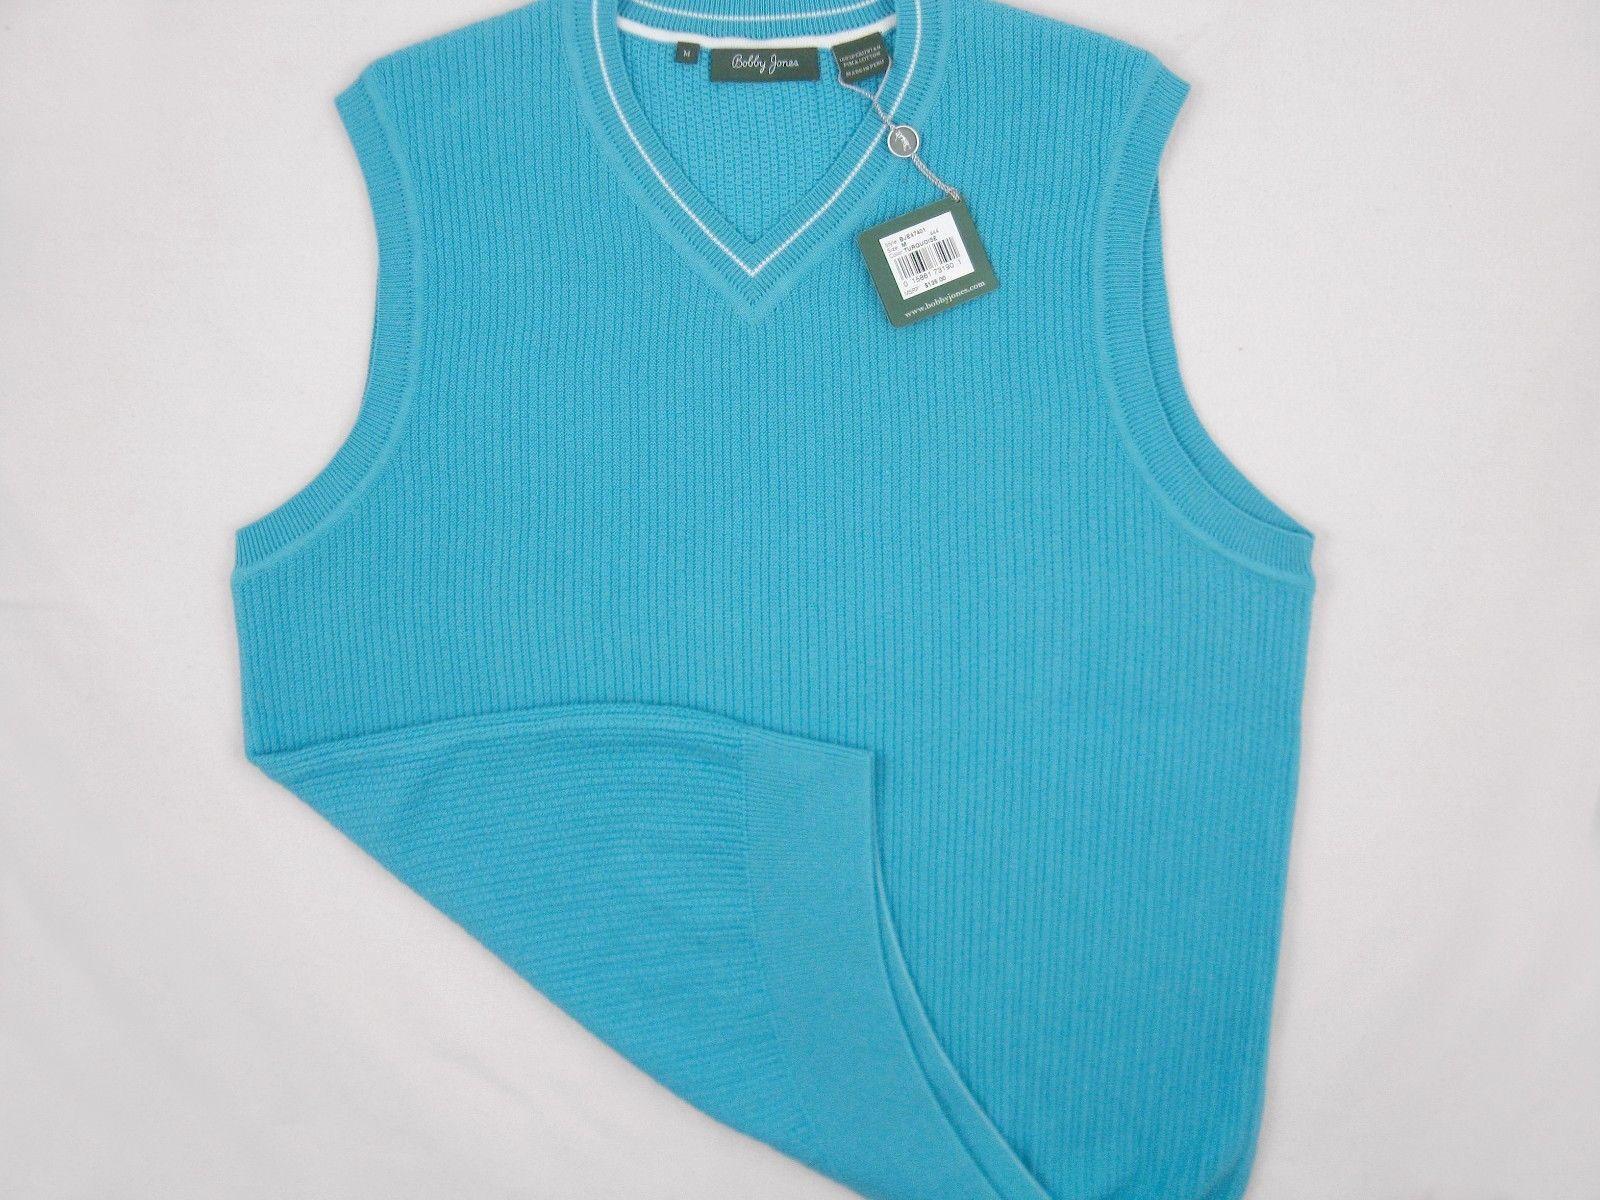 NEW! NWT! $135 Bobby Jones Collection Colorful Vest! 100% Peruvian Pima Cotton